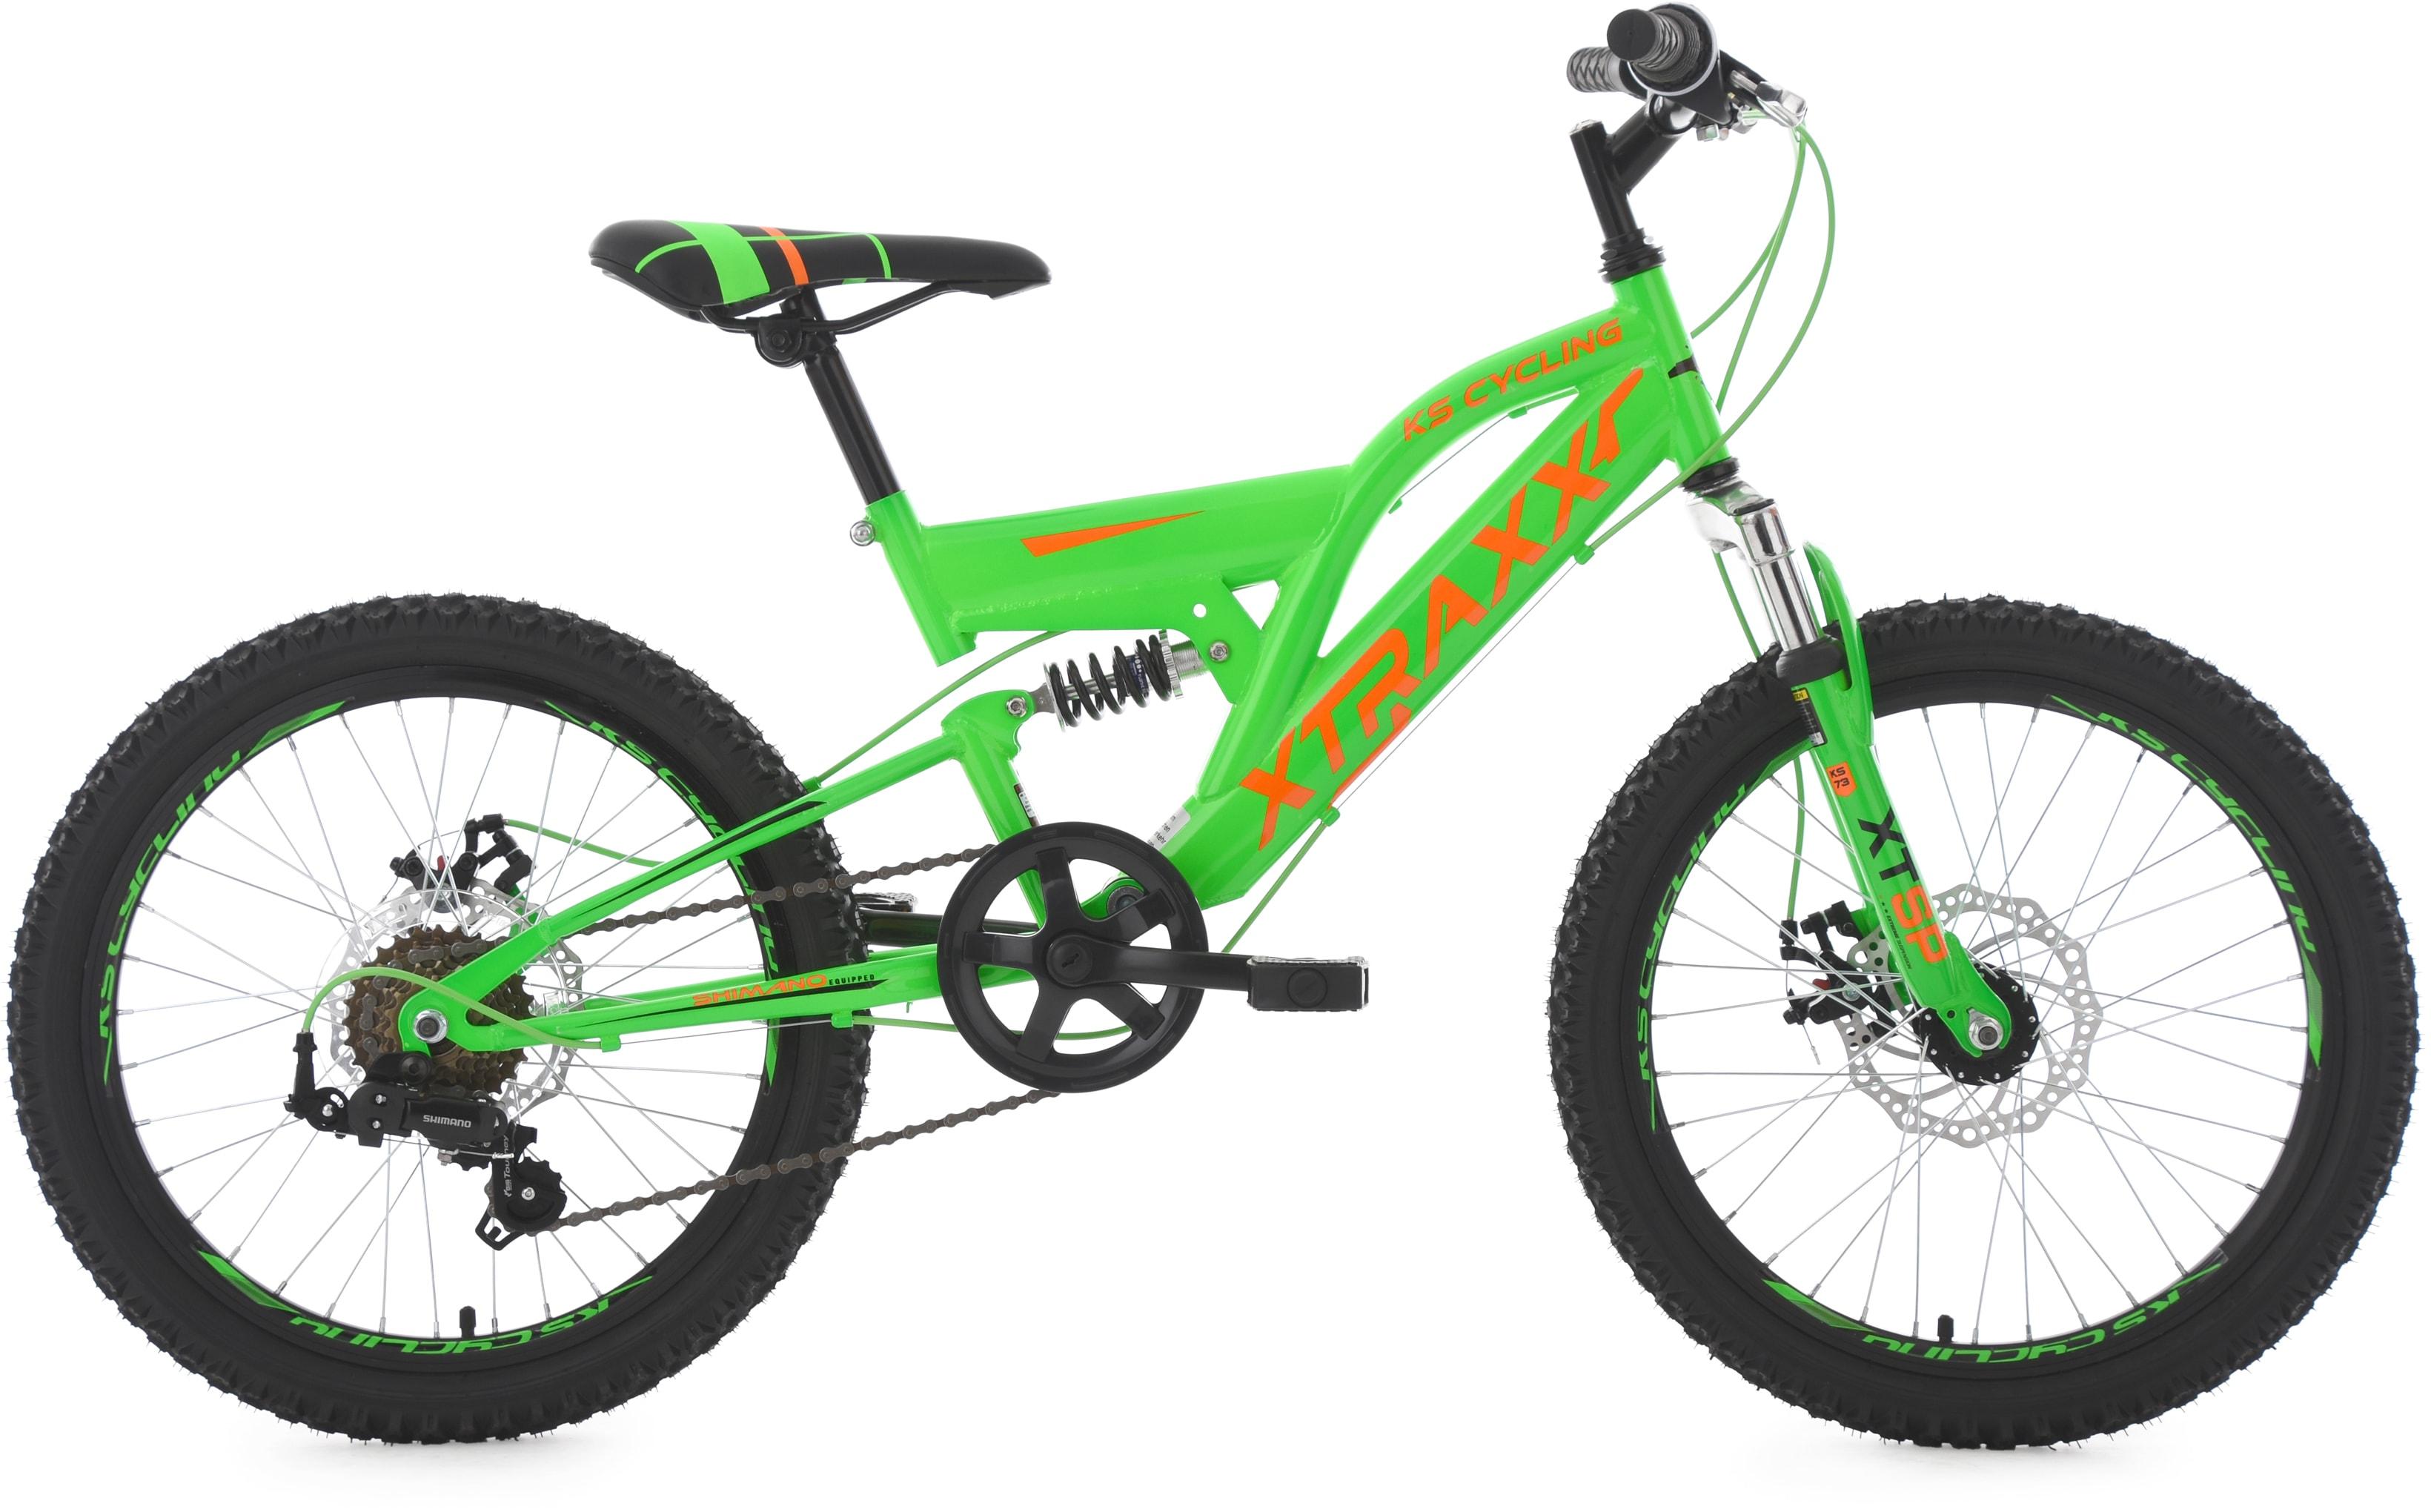 KS Cycling Jugendfahrrad XTRAXX, 7 Gang, Shimano, Tourney Schaltwerk, Kettenschaltung grün Kinder Kinderfahrräder Fahrräder Zubehör